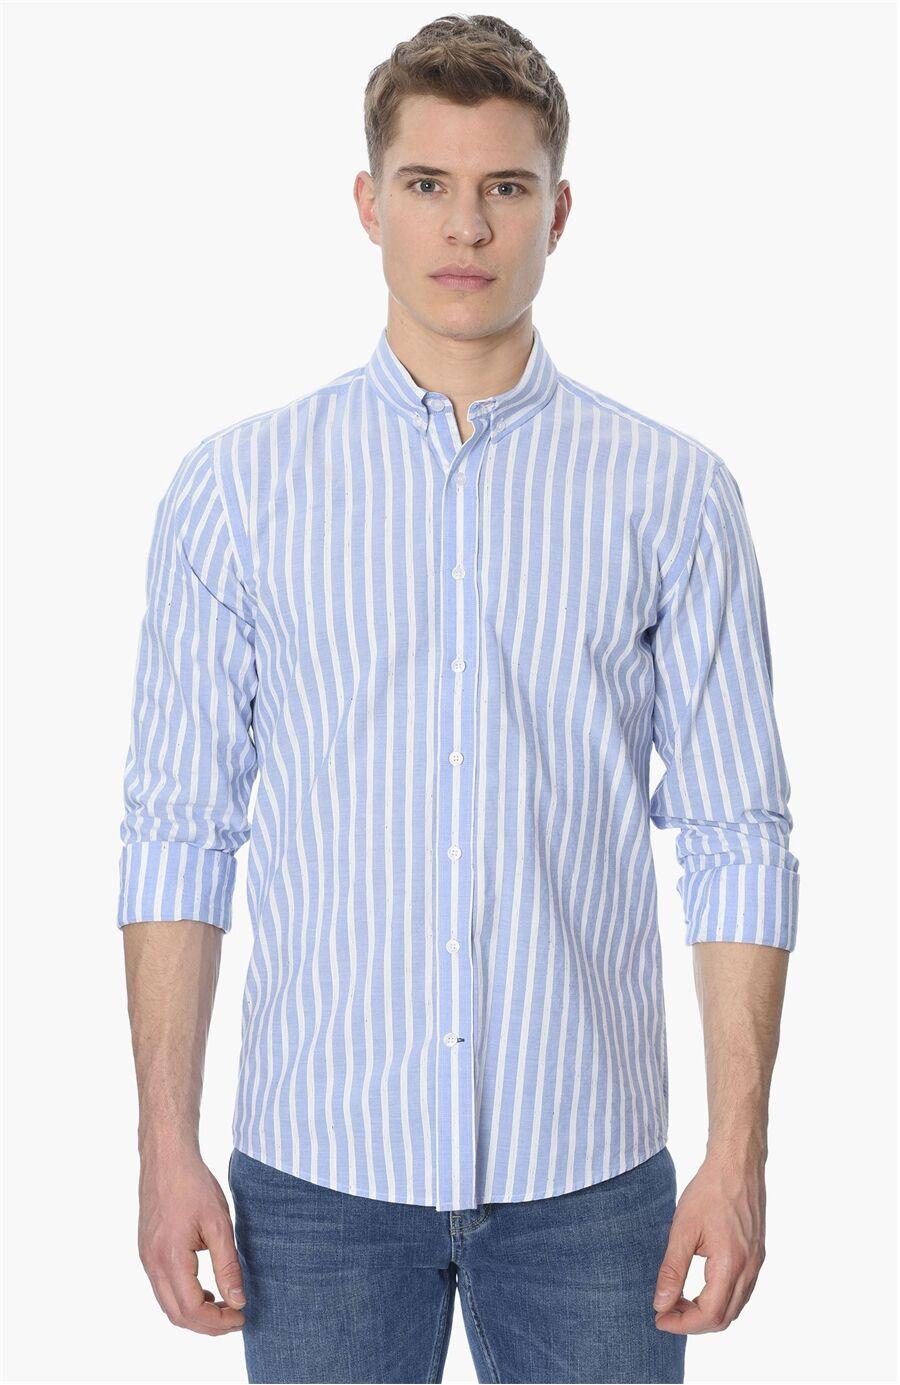 Çizgili Slım Fit Koyu Mavi Gömlek